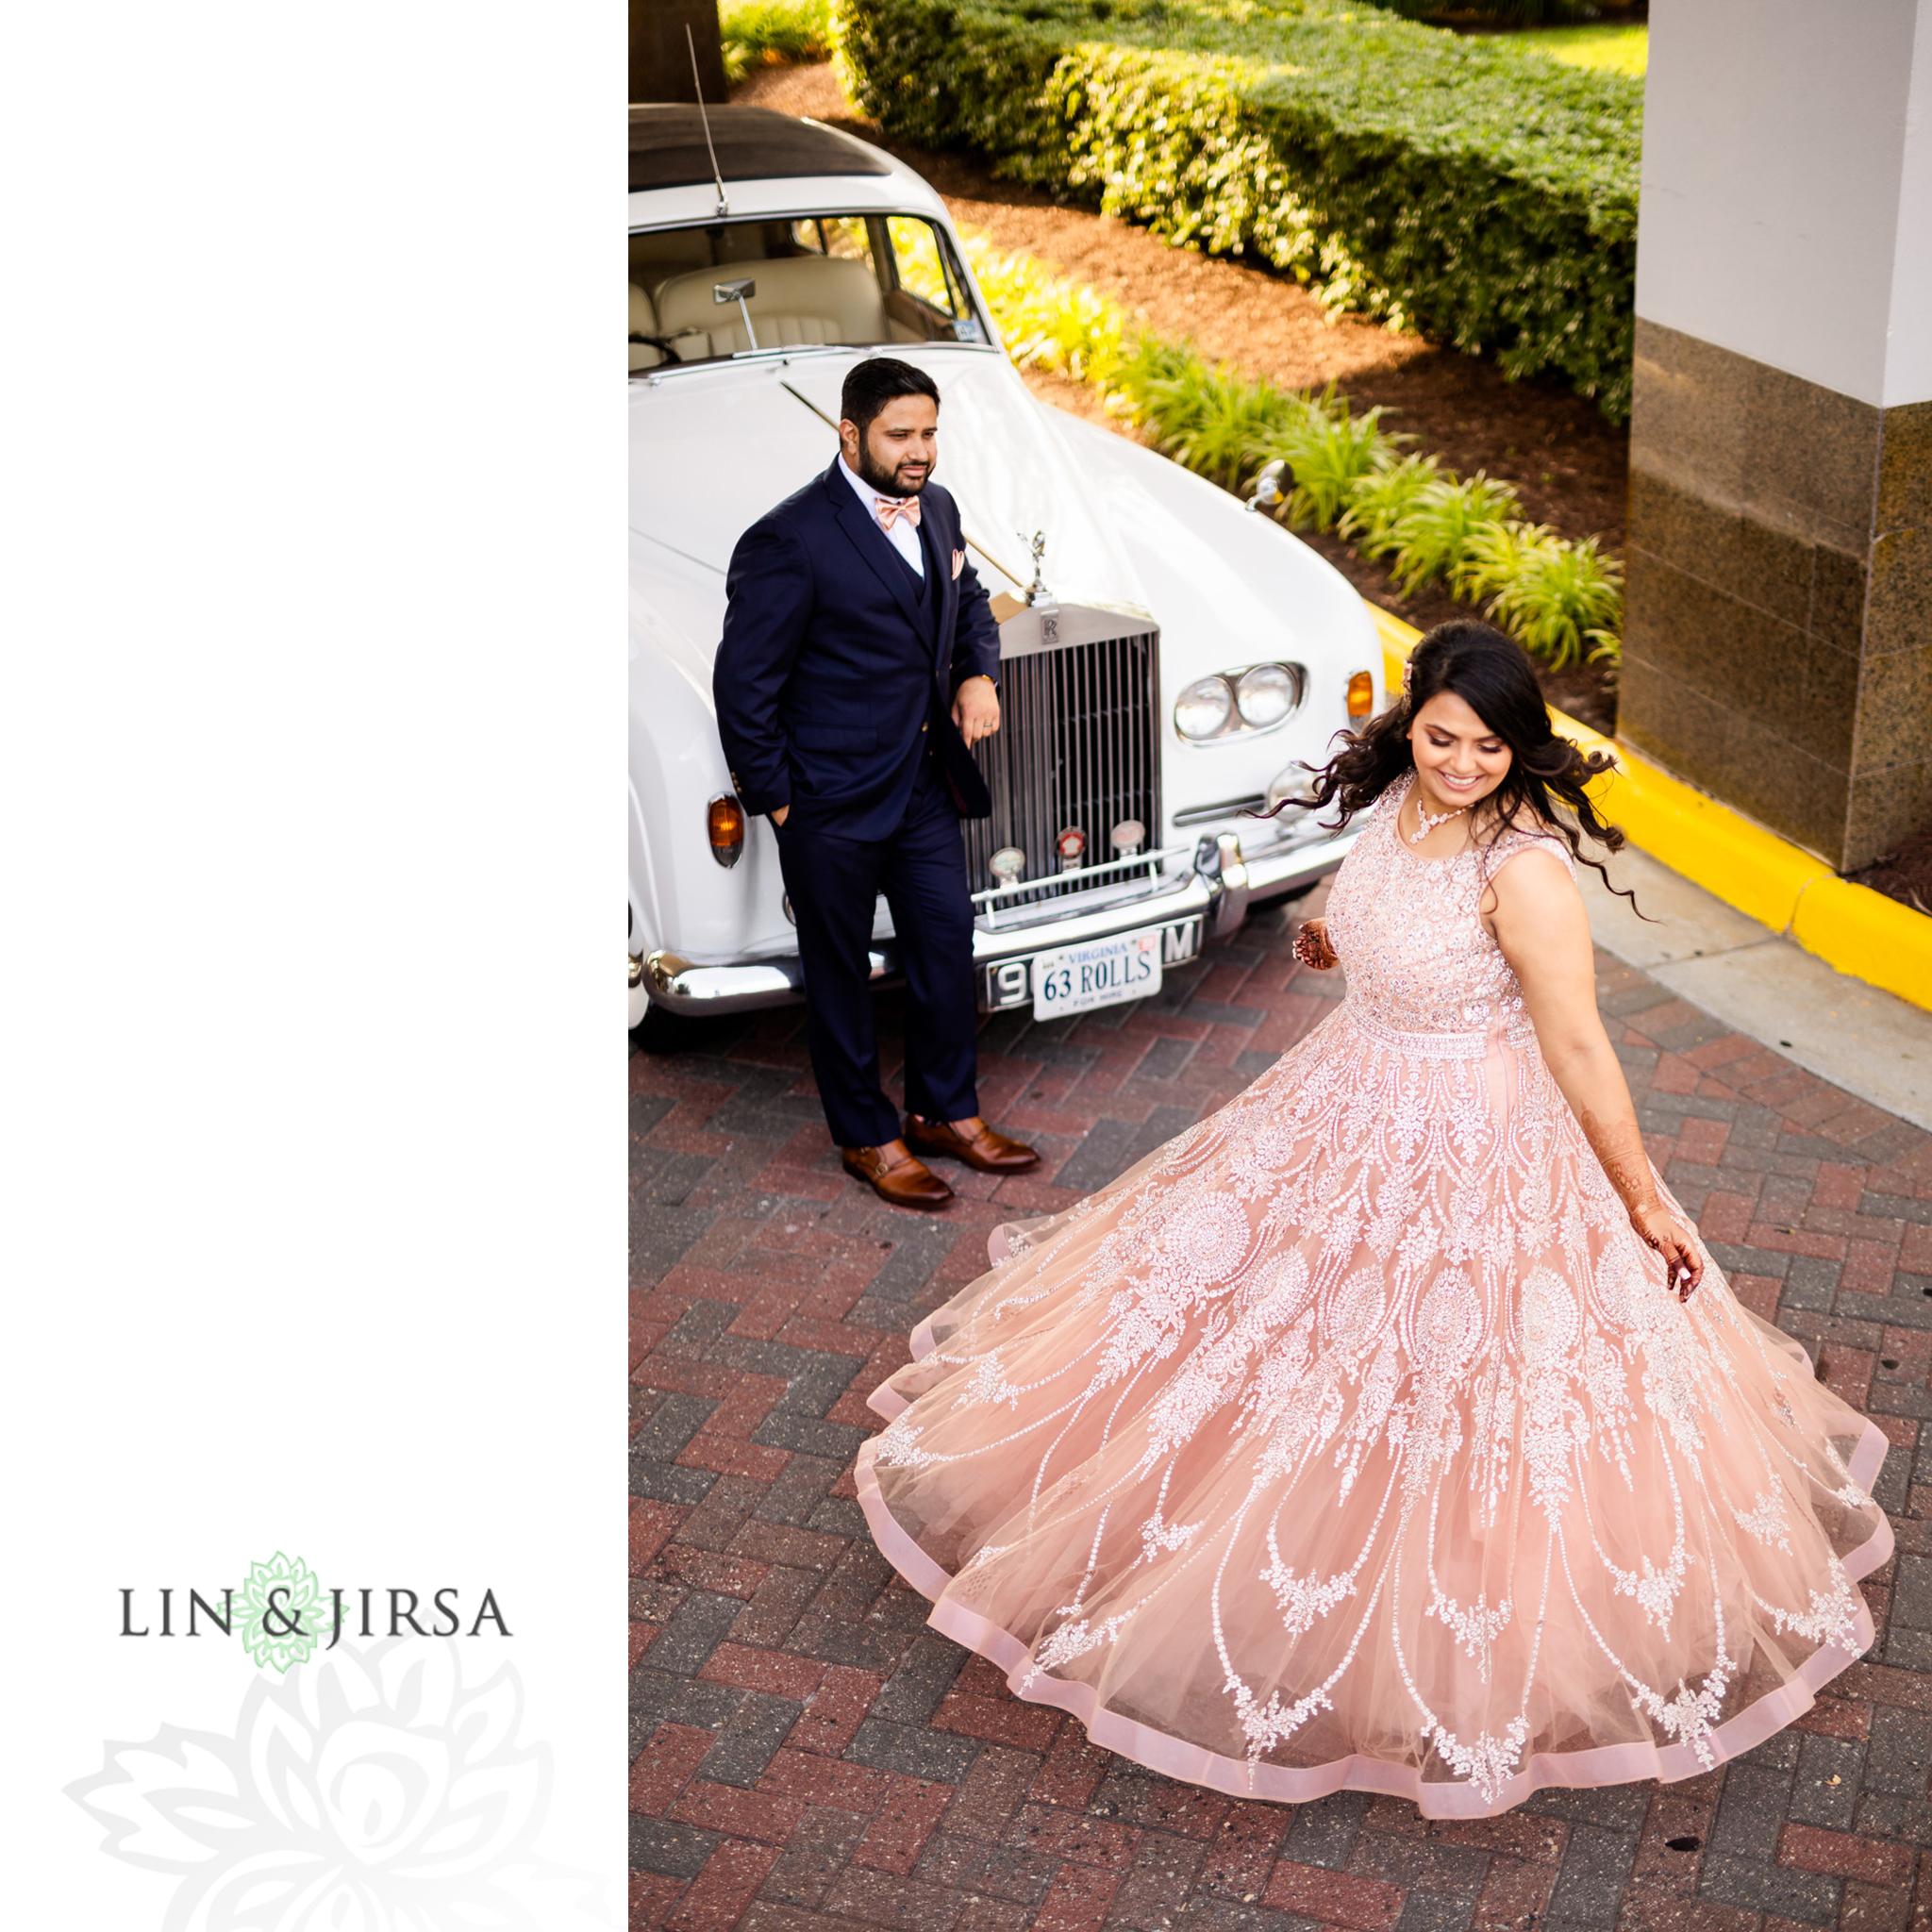 36 Delta Hotels Chesapeake Norfolk Virginia Indian Wedding Photography